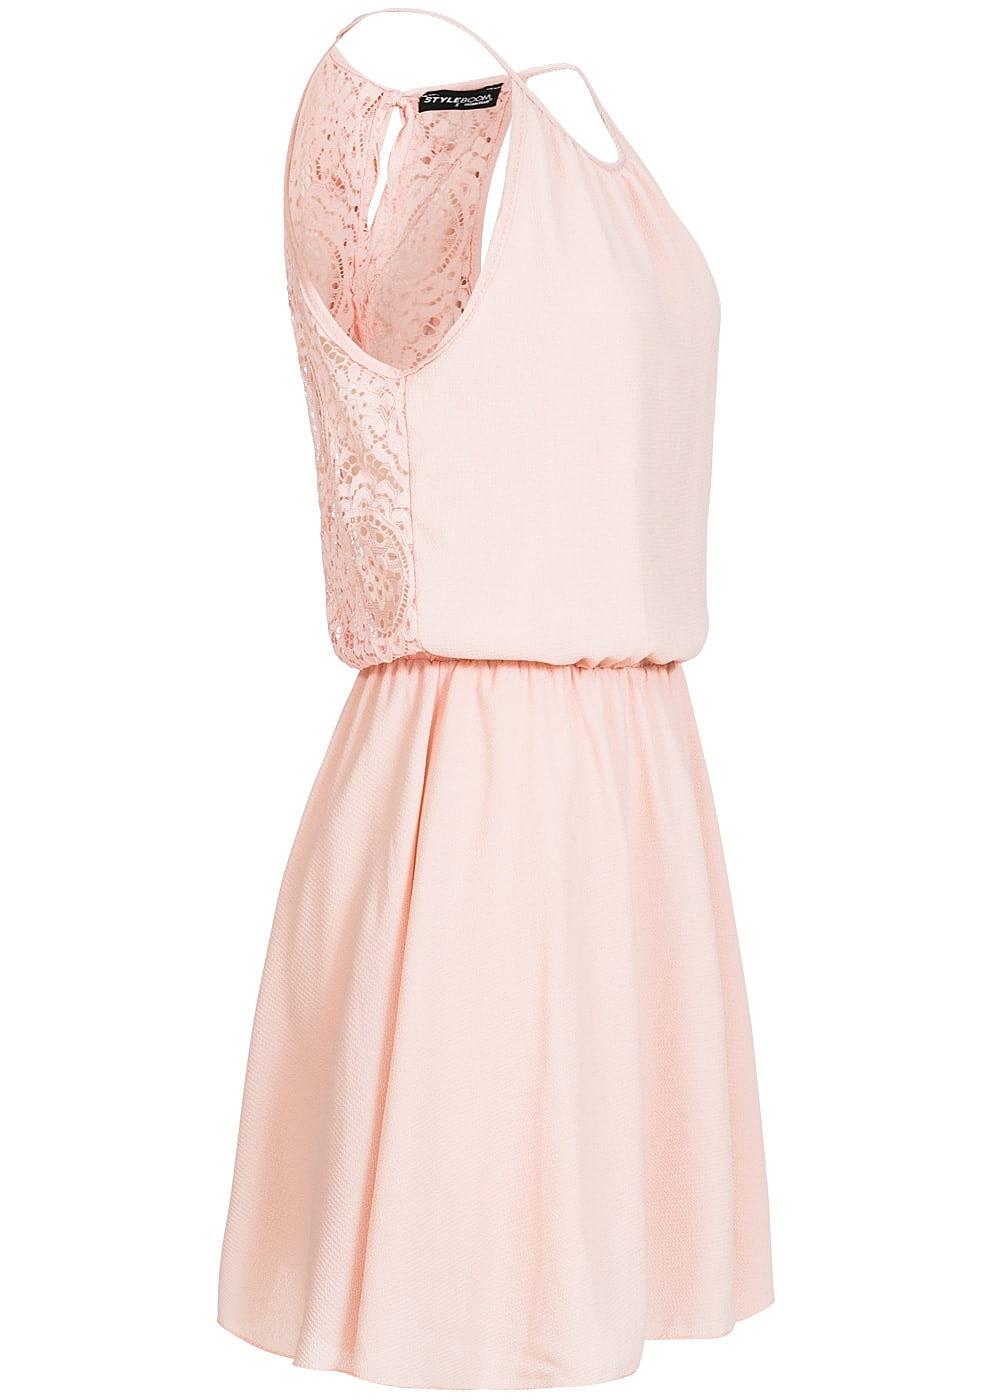 Rosa kleider midi